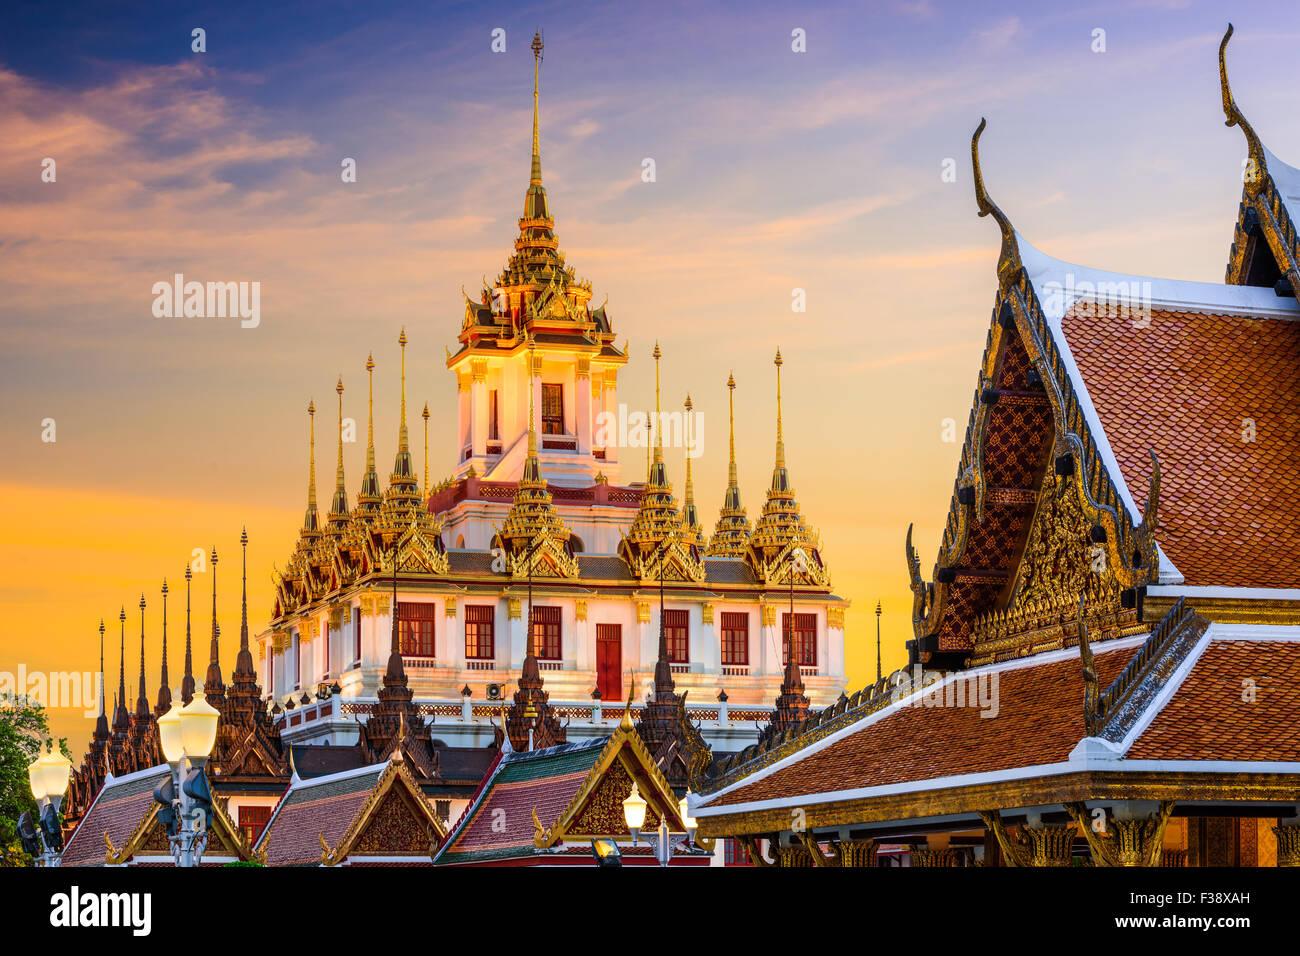 Wat Ratchanatdaram in Bangkok, Thailand. - Stock Image